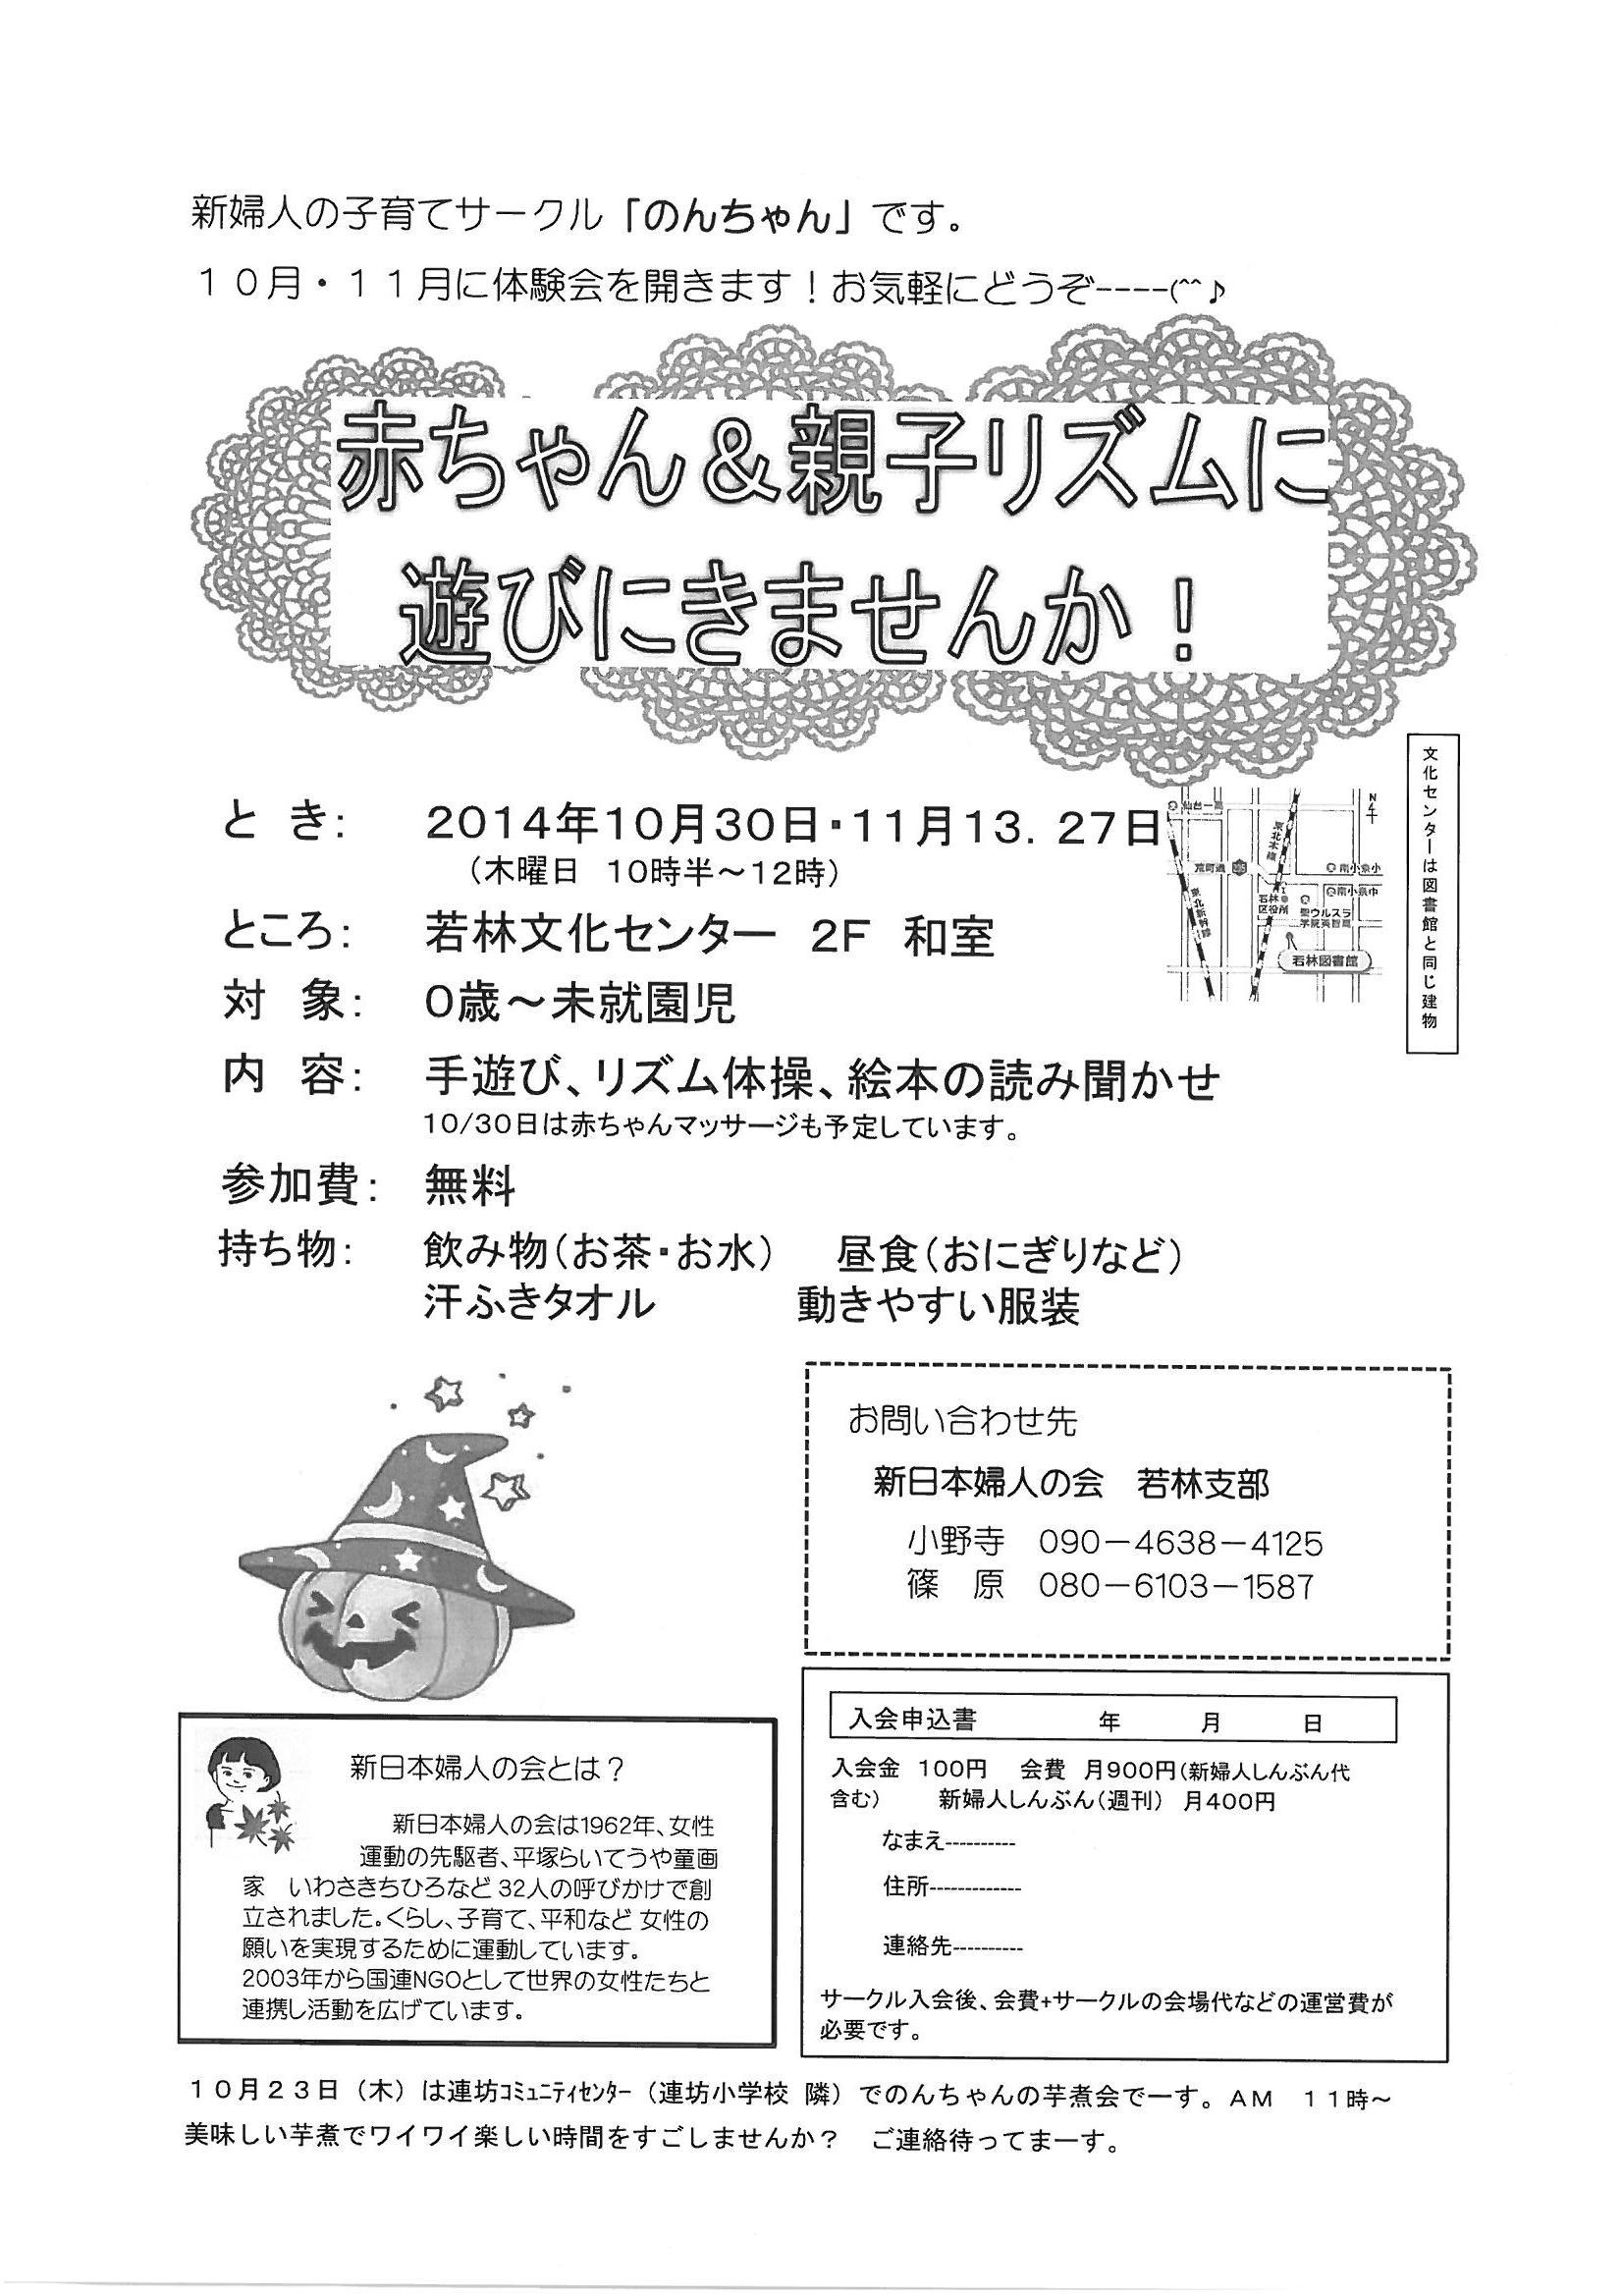 SKMBT_C22014102413310_0001.jpg